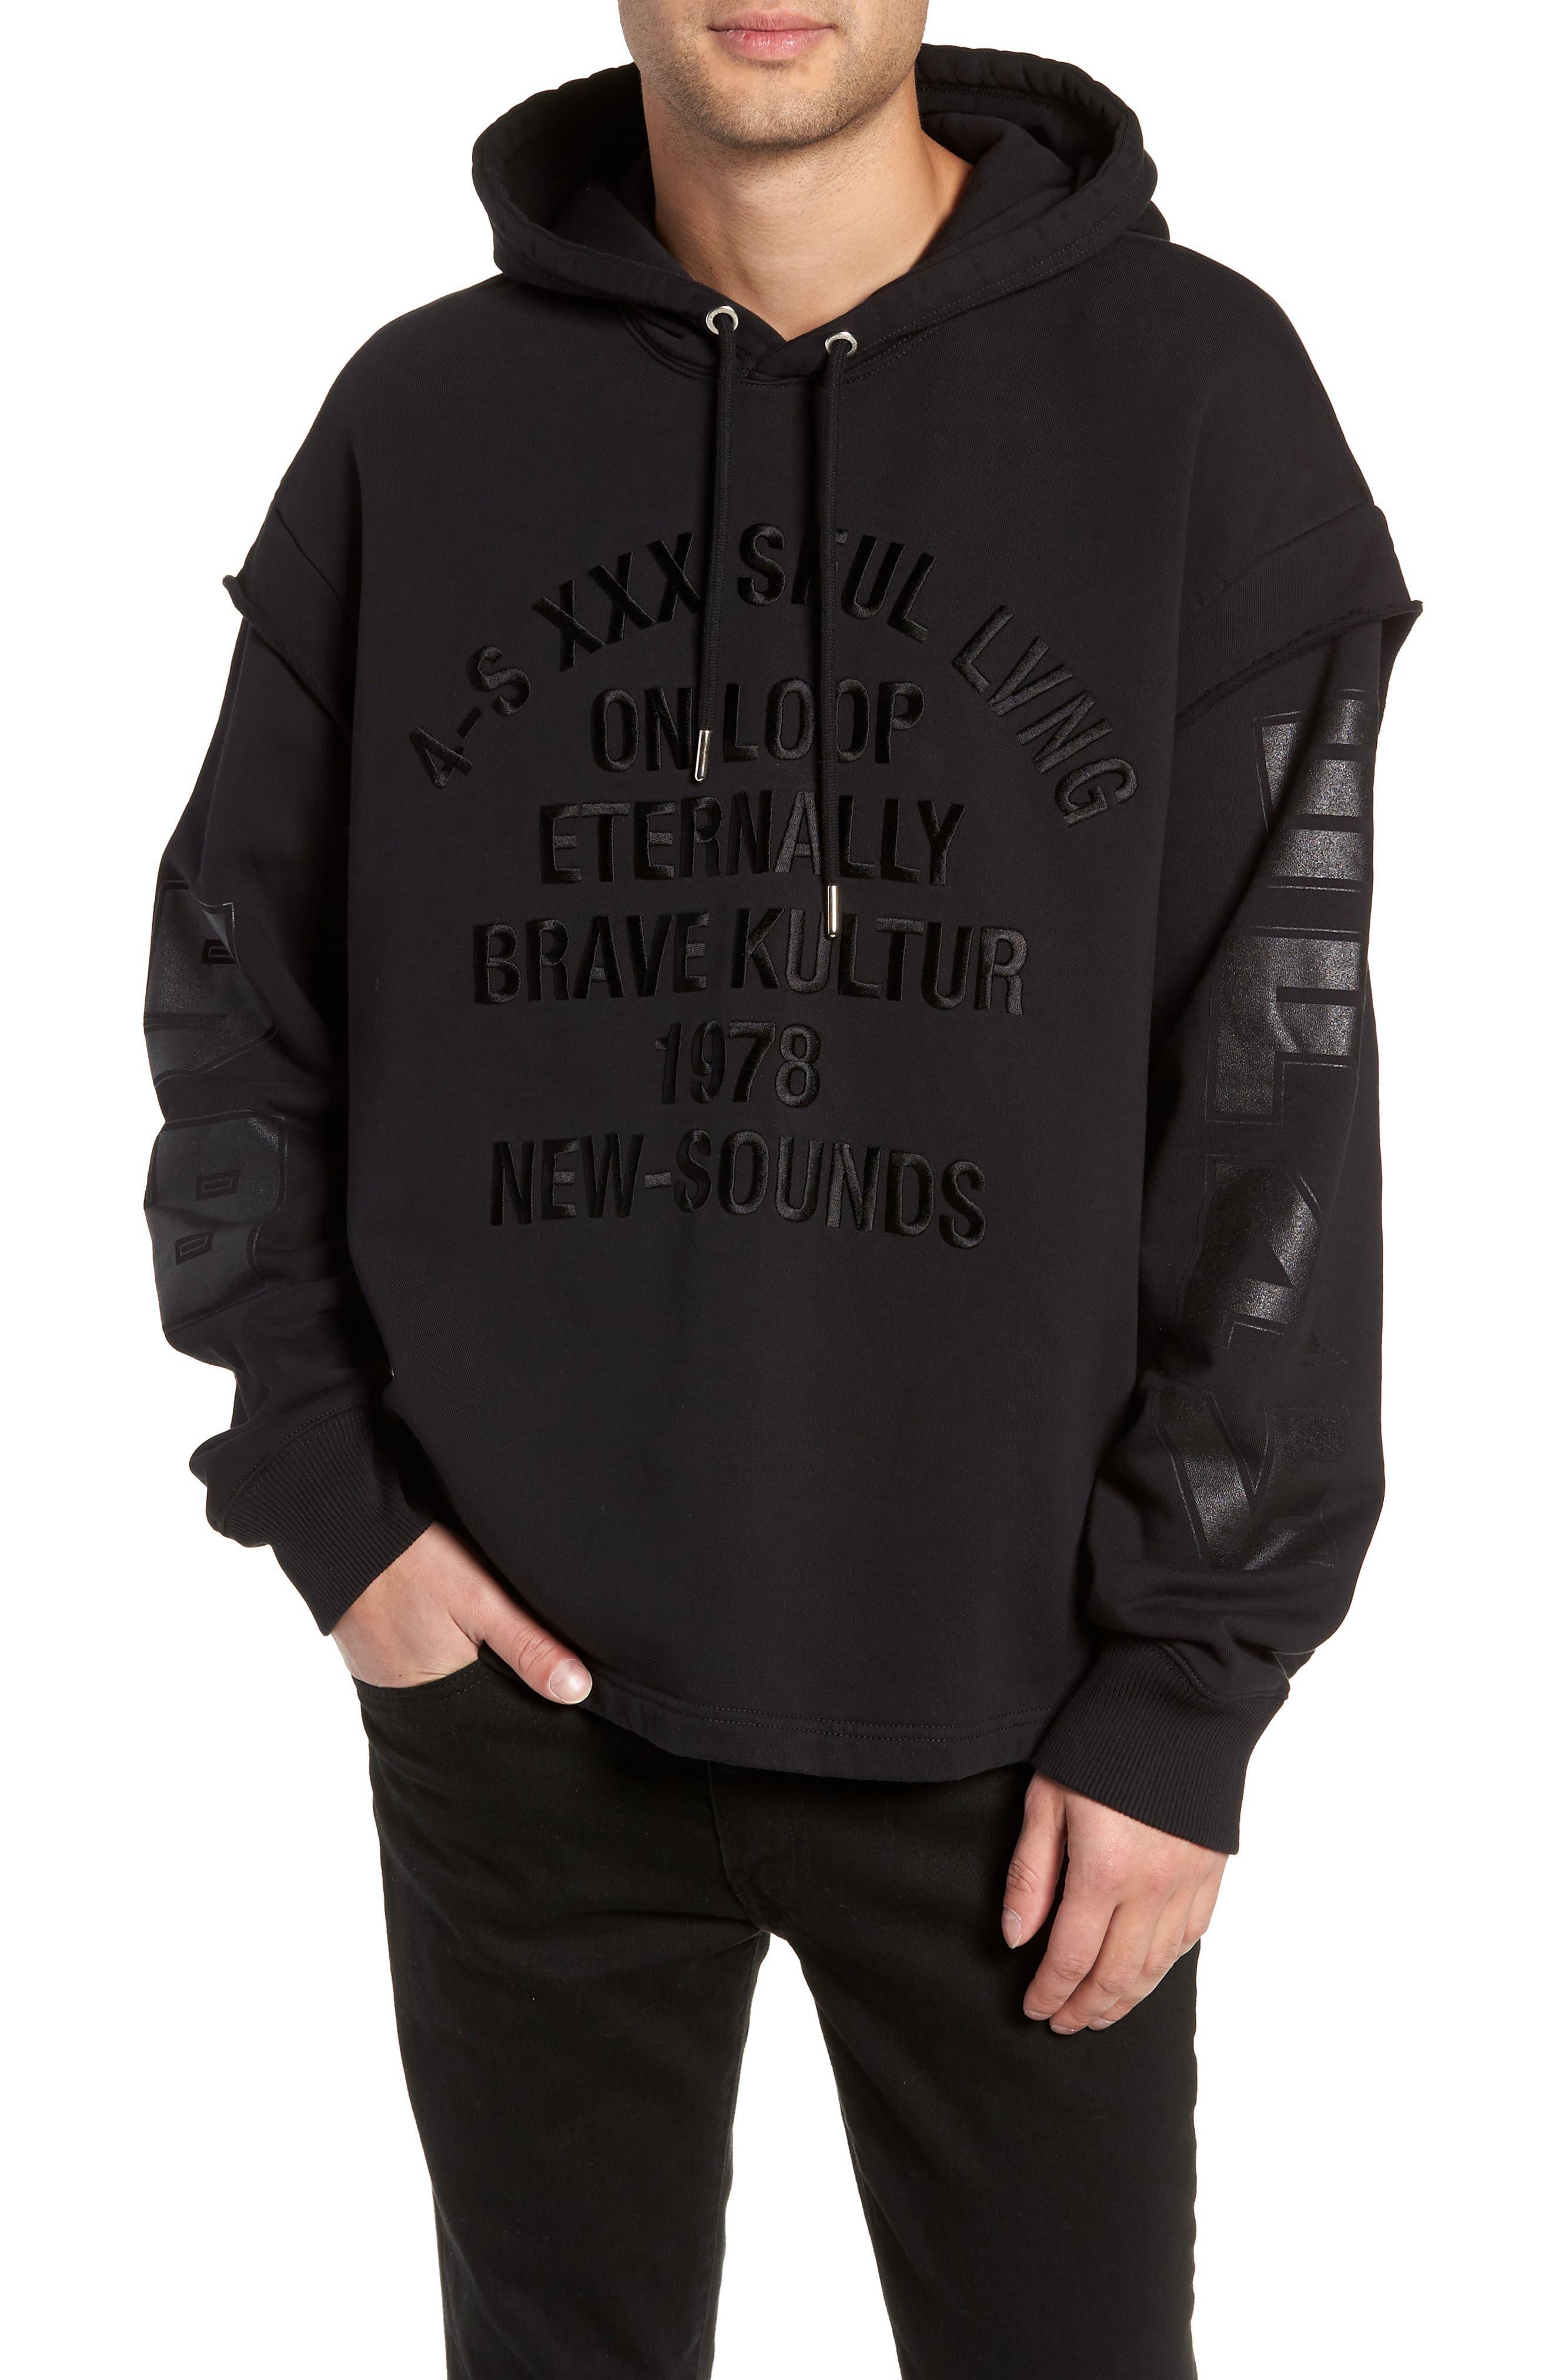 S-DRIVE-LS-XA Embroidered Hooded Sweatshirt,                         Main,                         color, BLACK